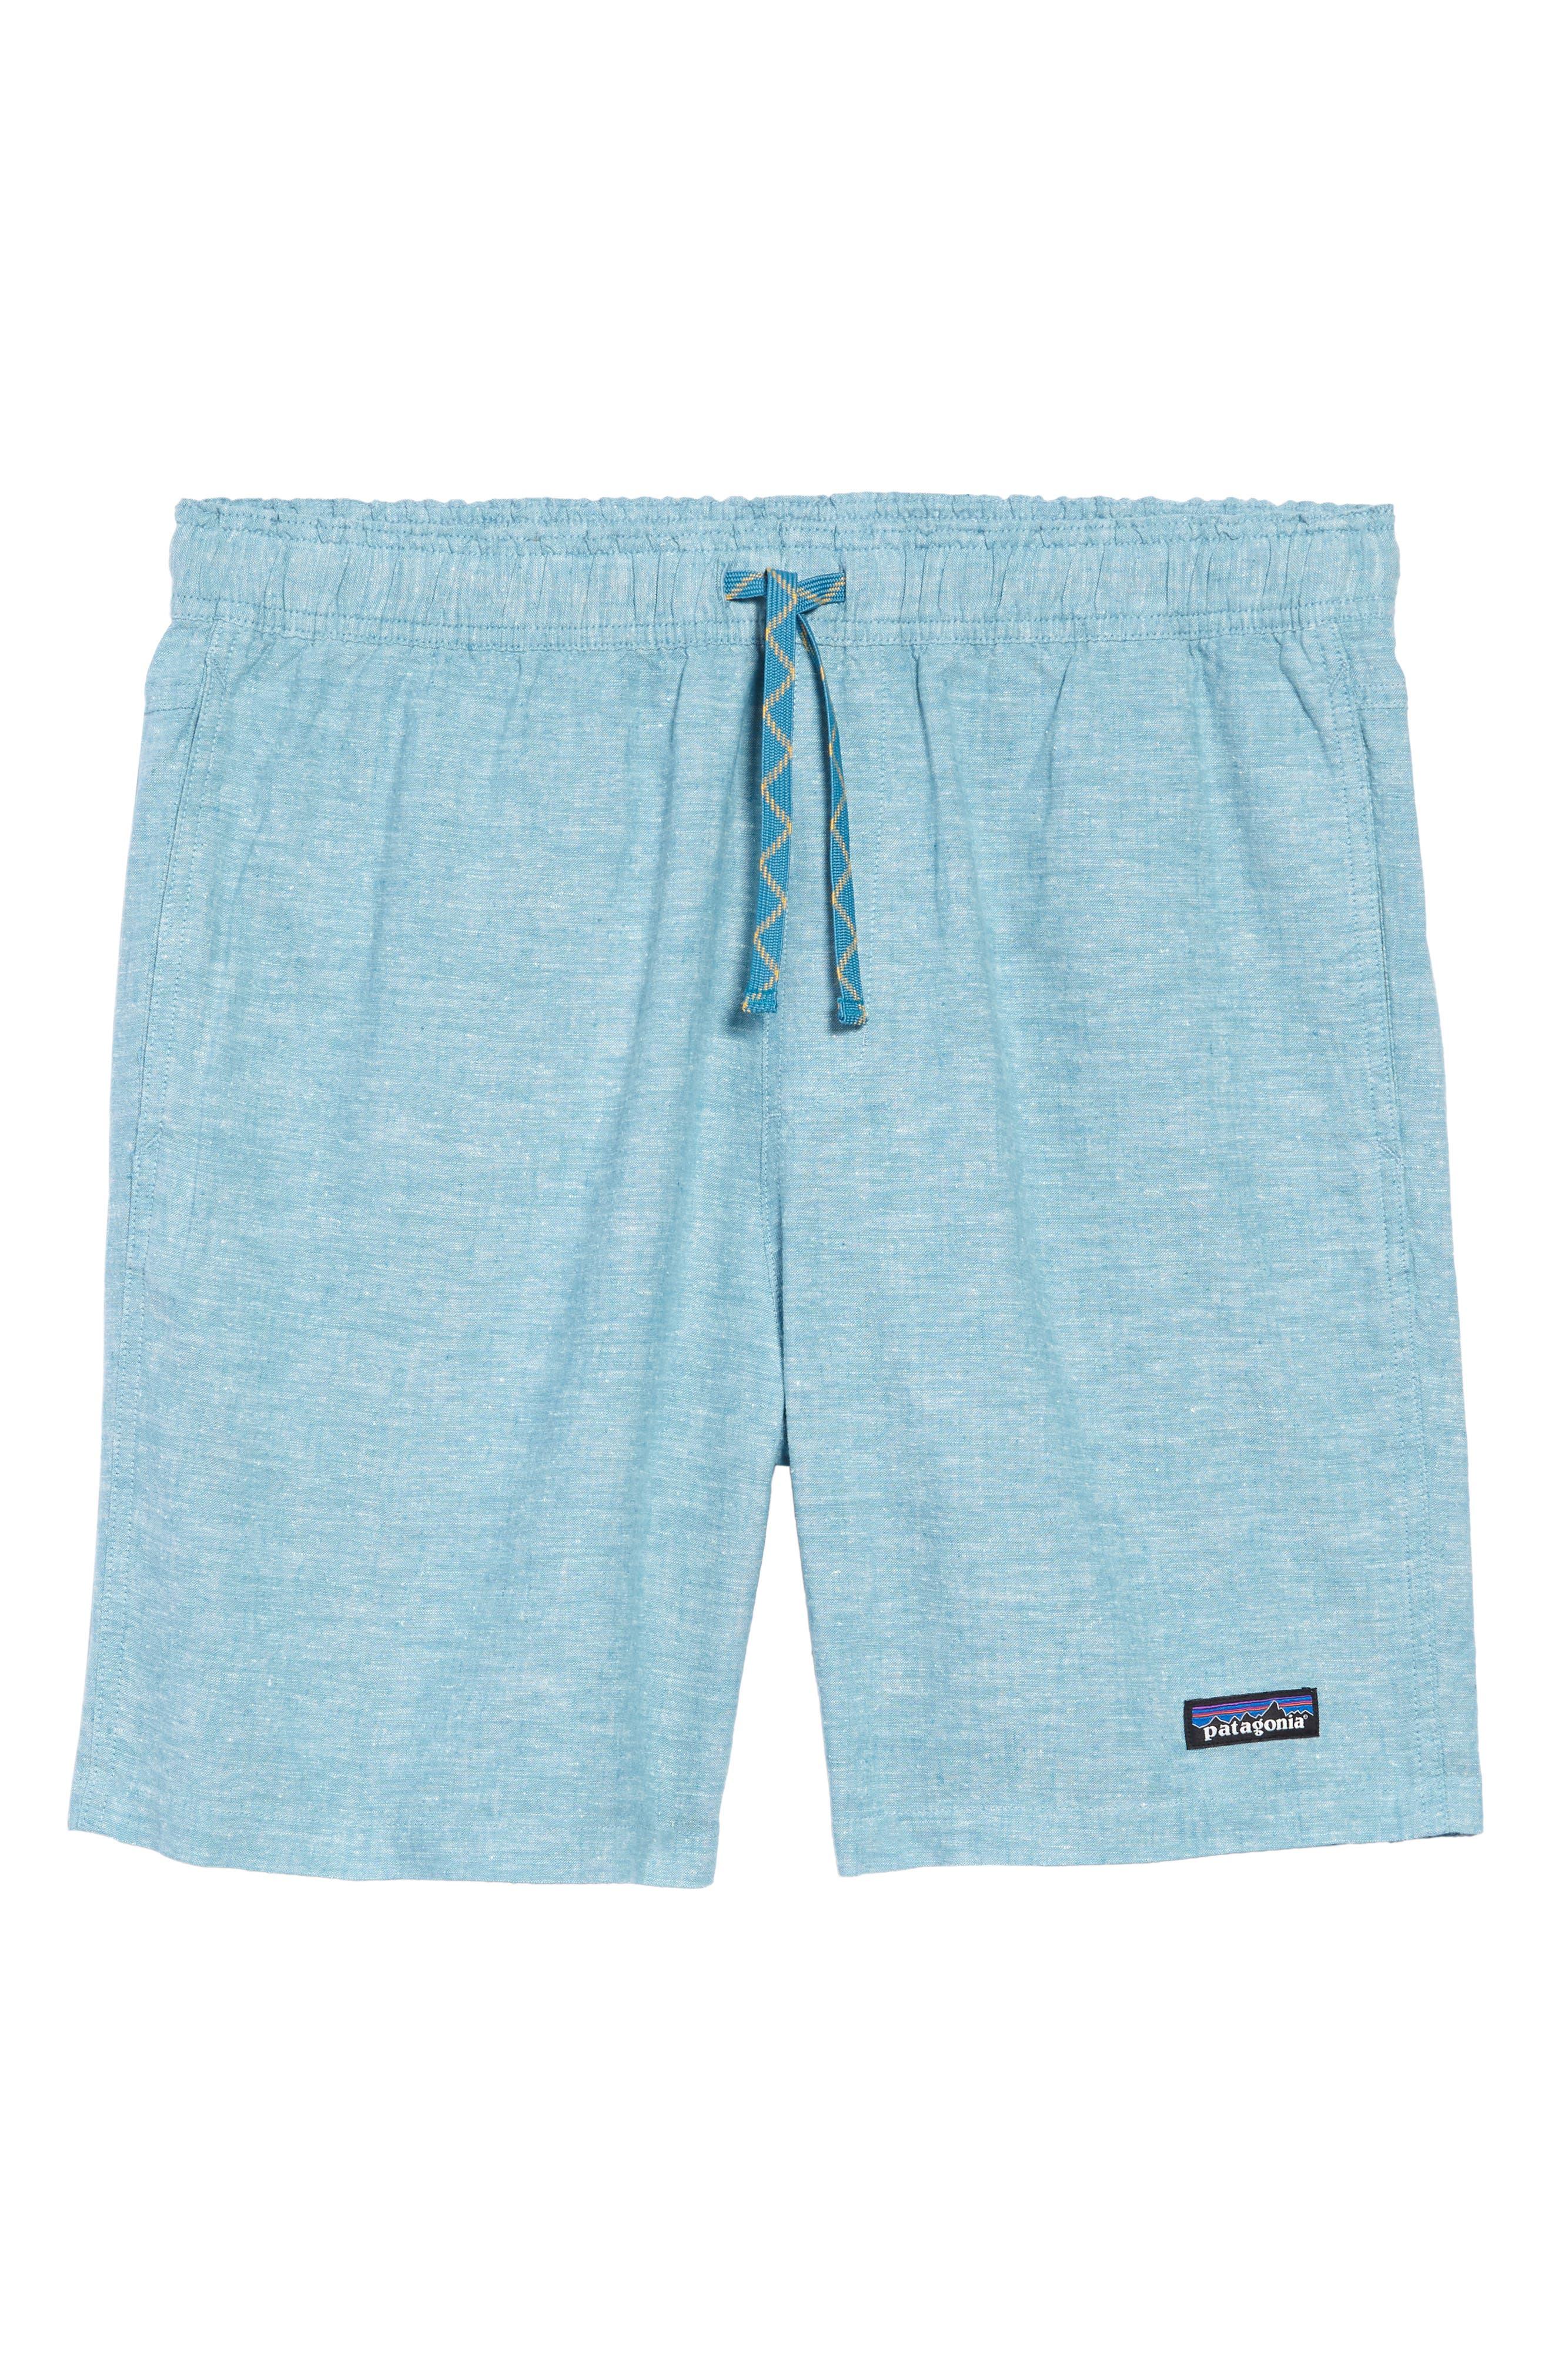 Patagonia Baggies Natural Hemp Blend Shorts, Blue